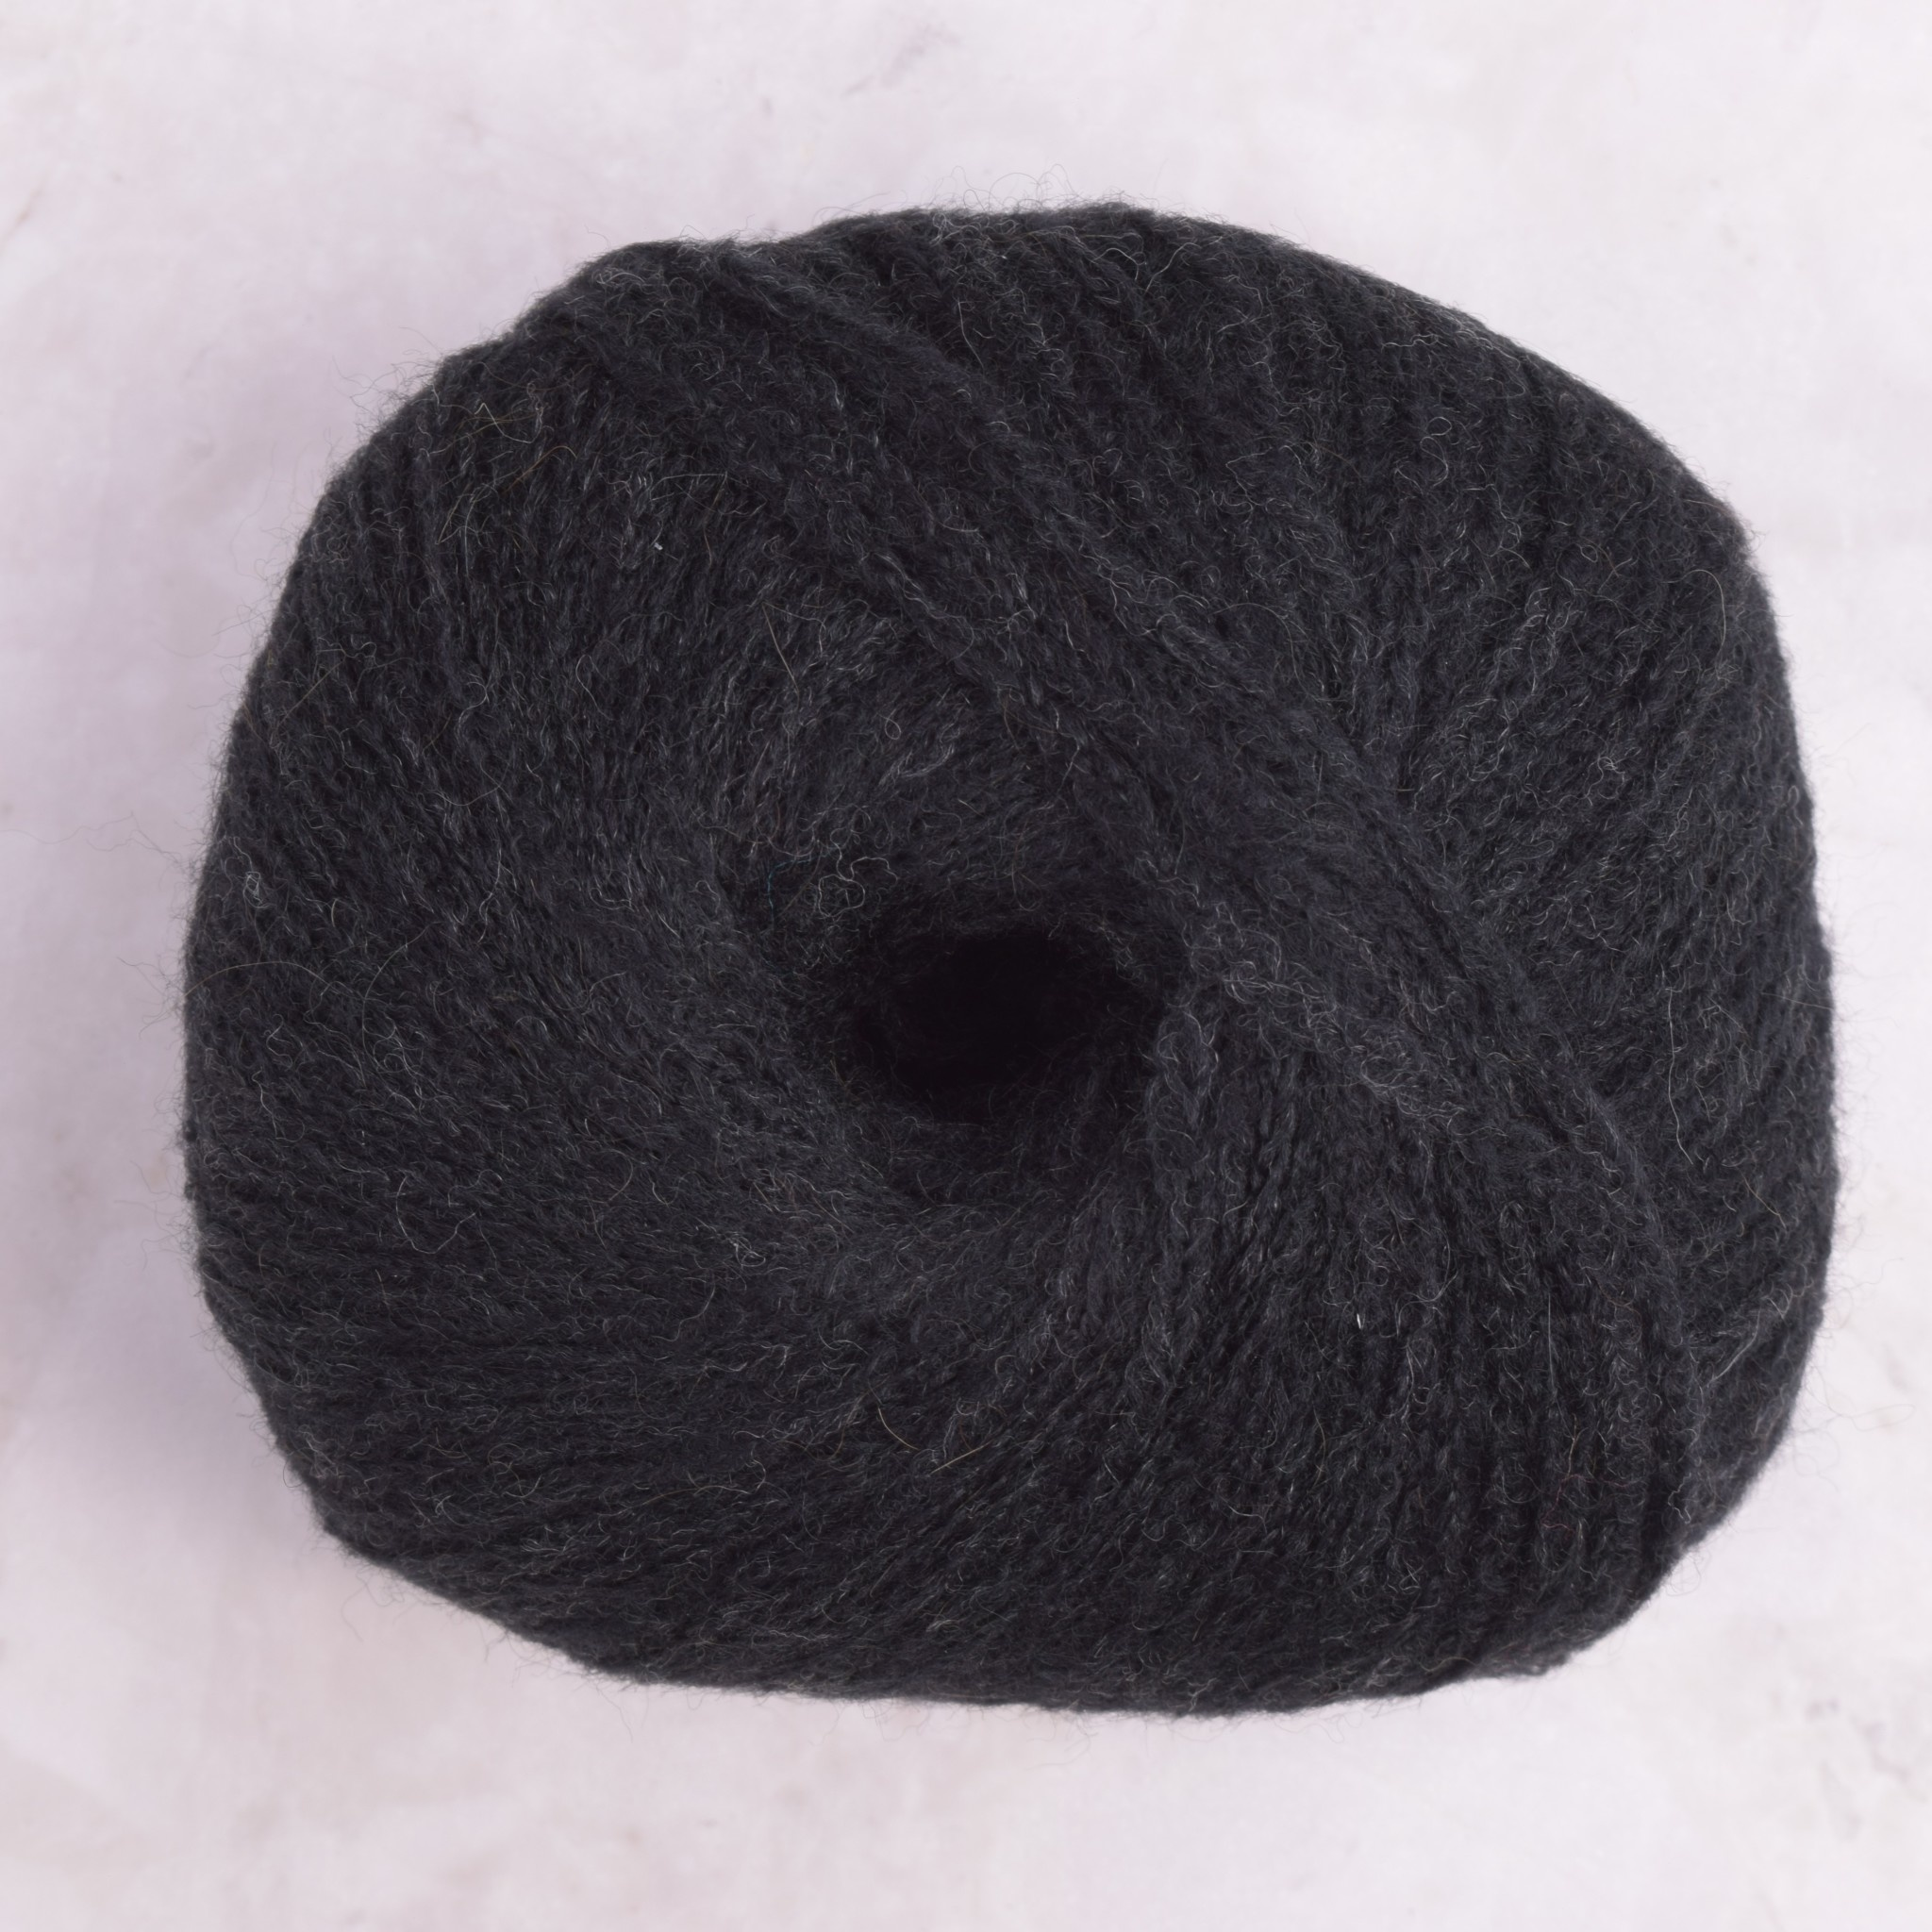 Image of Lang Nova 4 Black